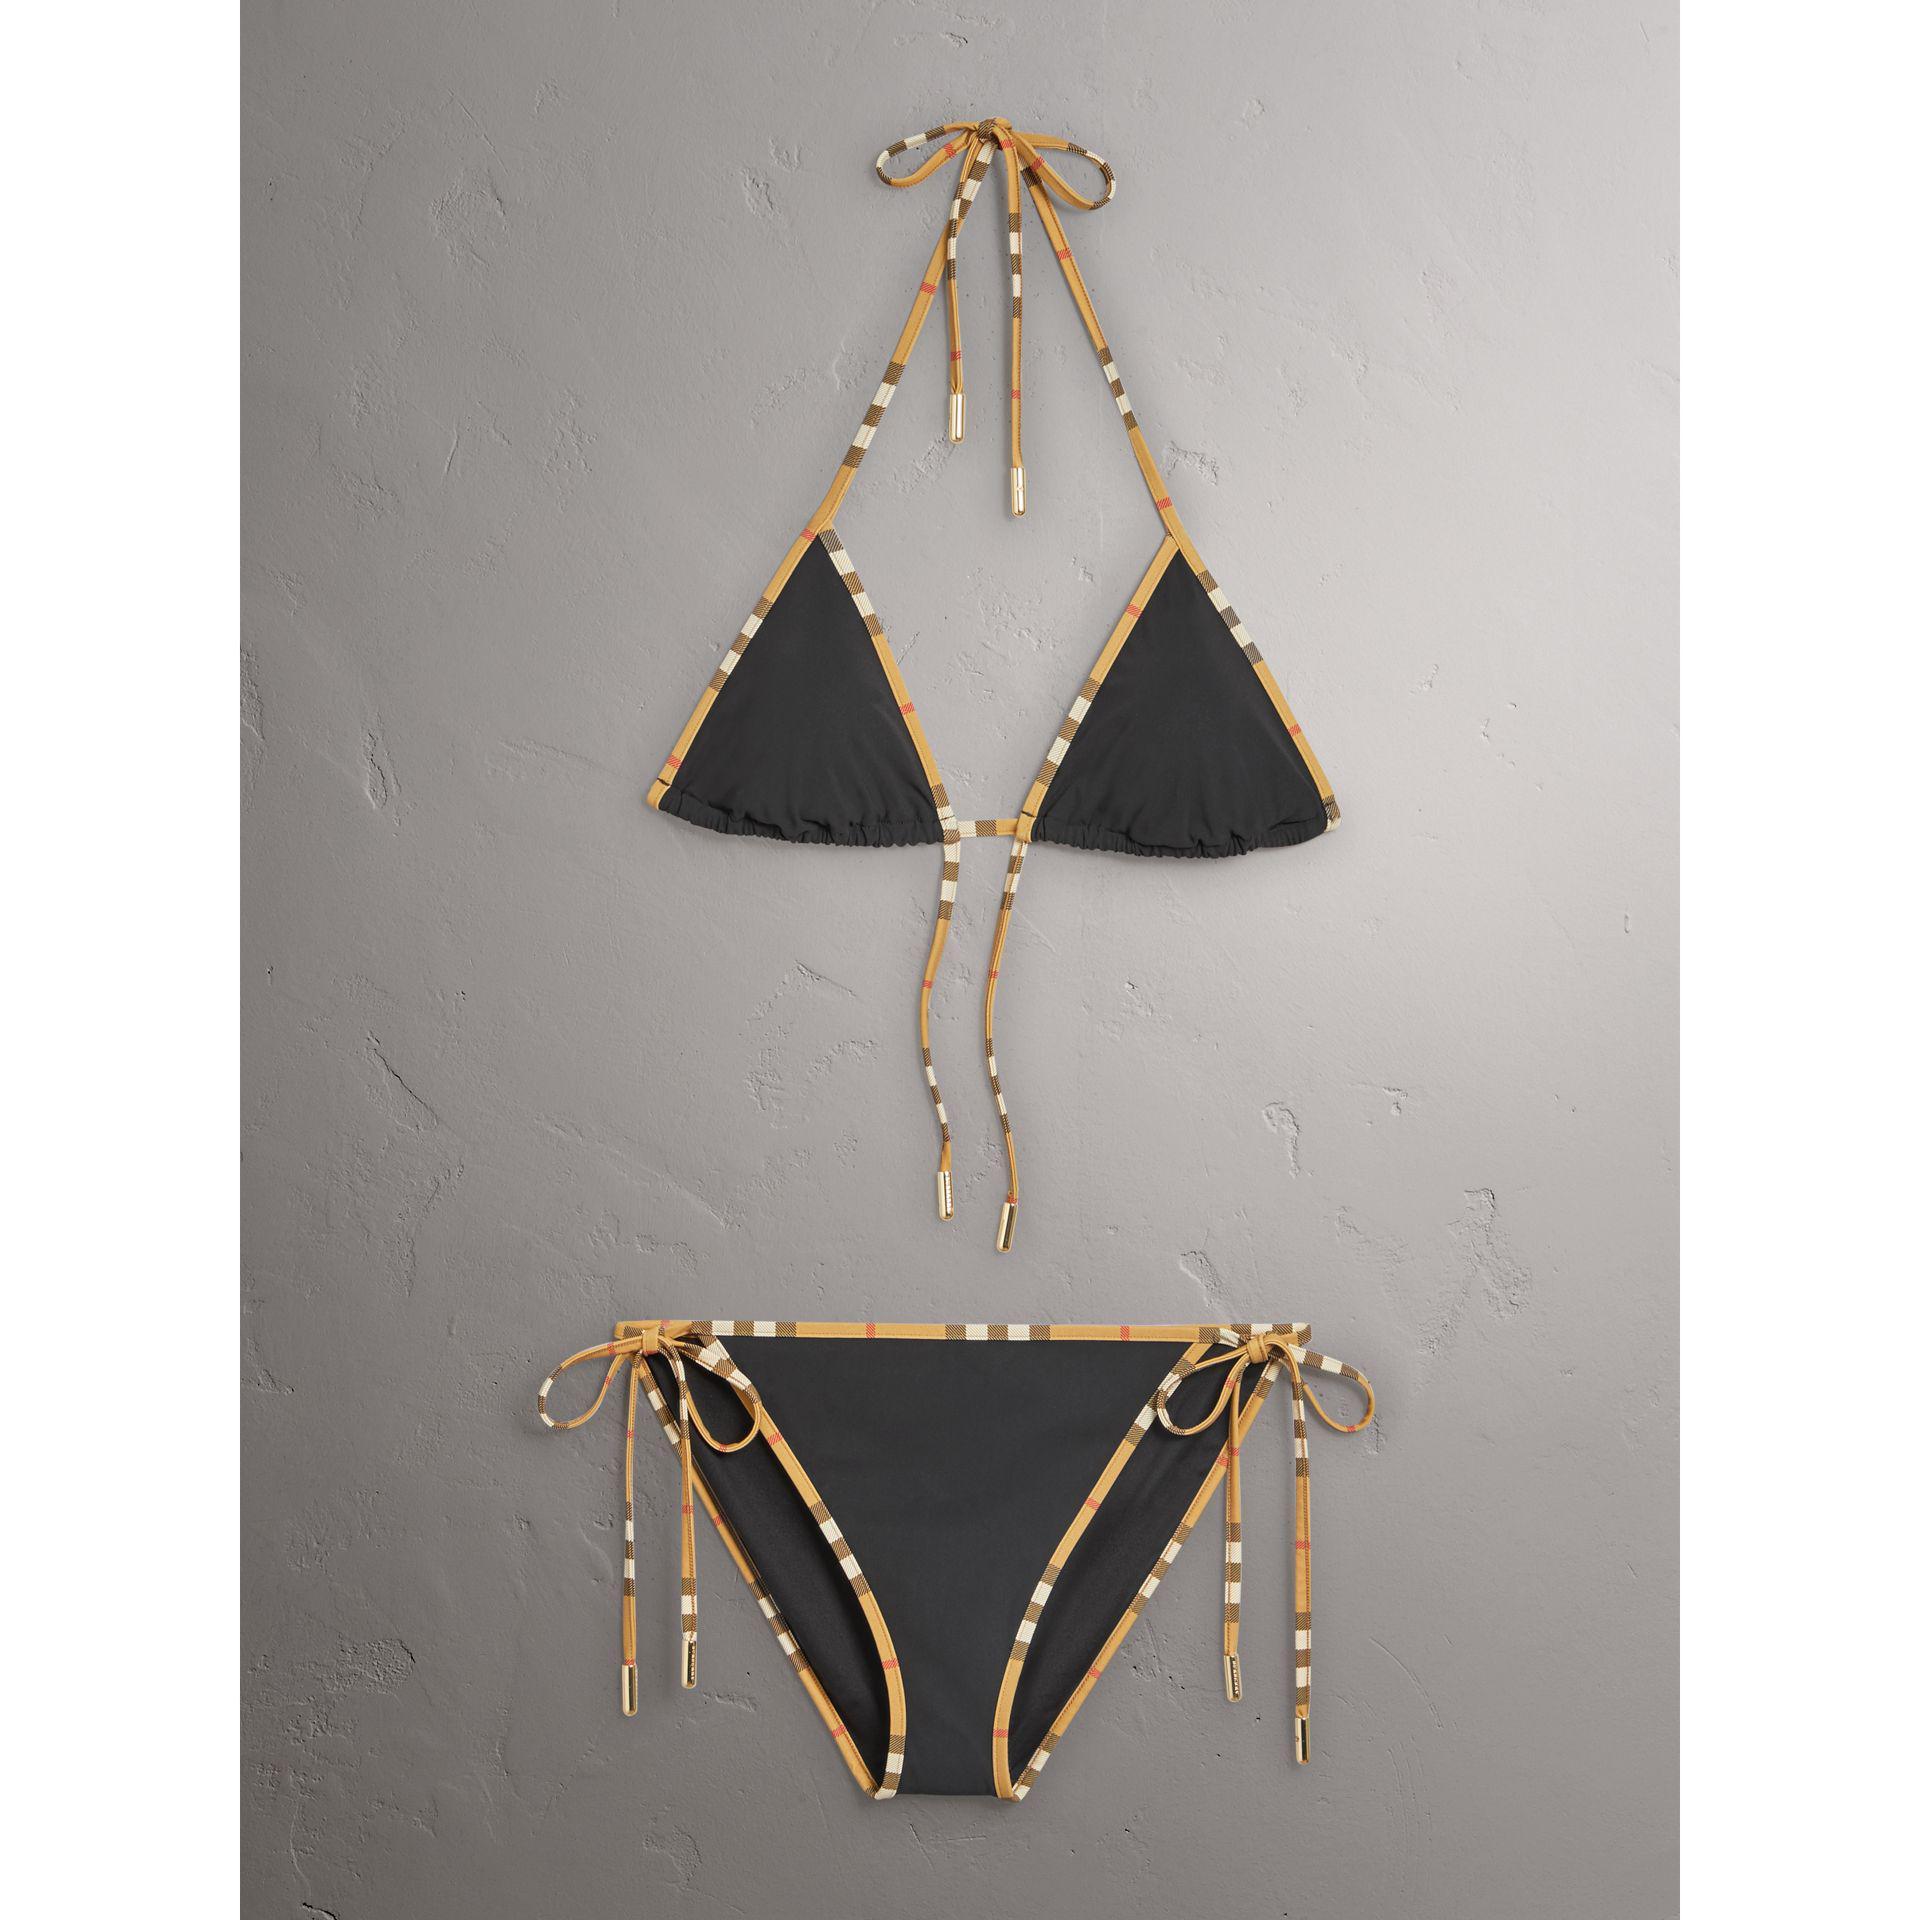 00f54a0d798f5 Burberry Vintage Check Trim Triangle Bikini in Black - Lyst